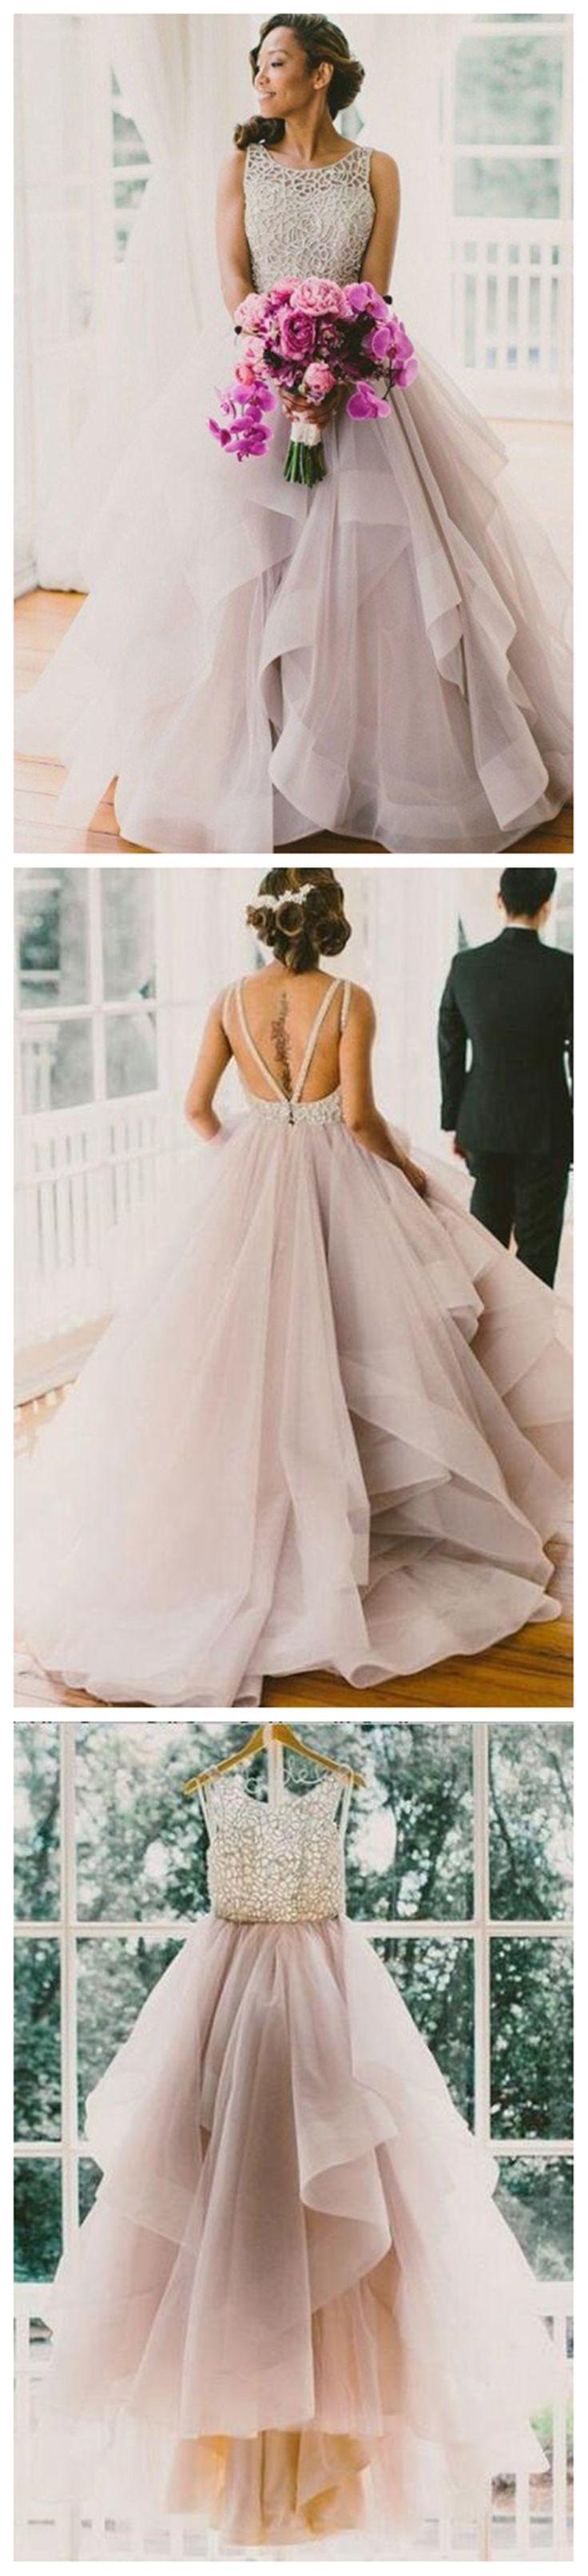 A line Scoop Neckline Organza Wedding Dresses, 2017 Long Custom Wedding Gowns, Affordable Bridal Dresses, 17115